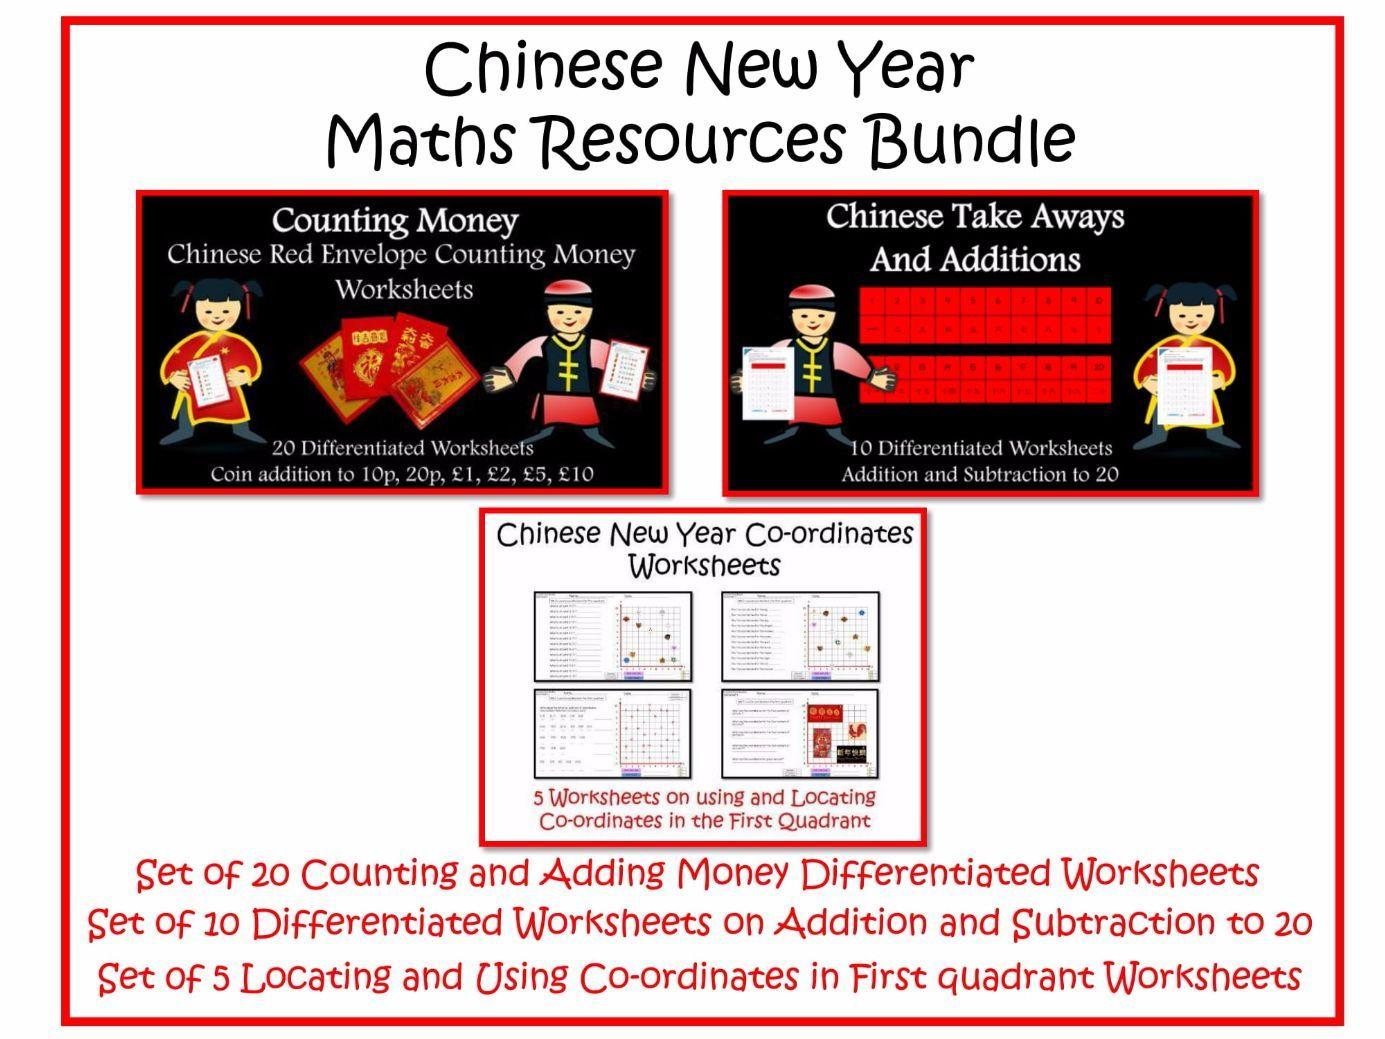 Chinese New Year Maths